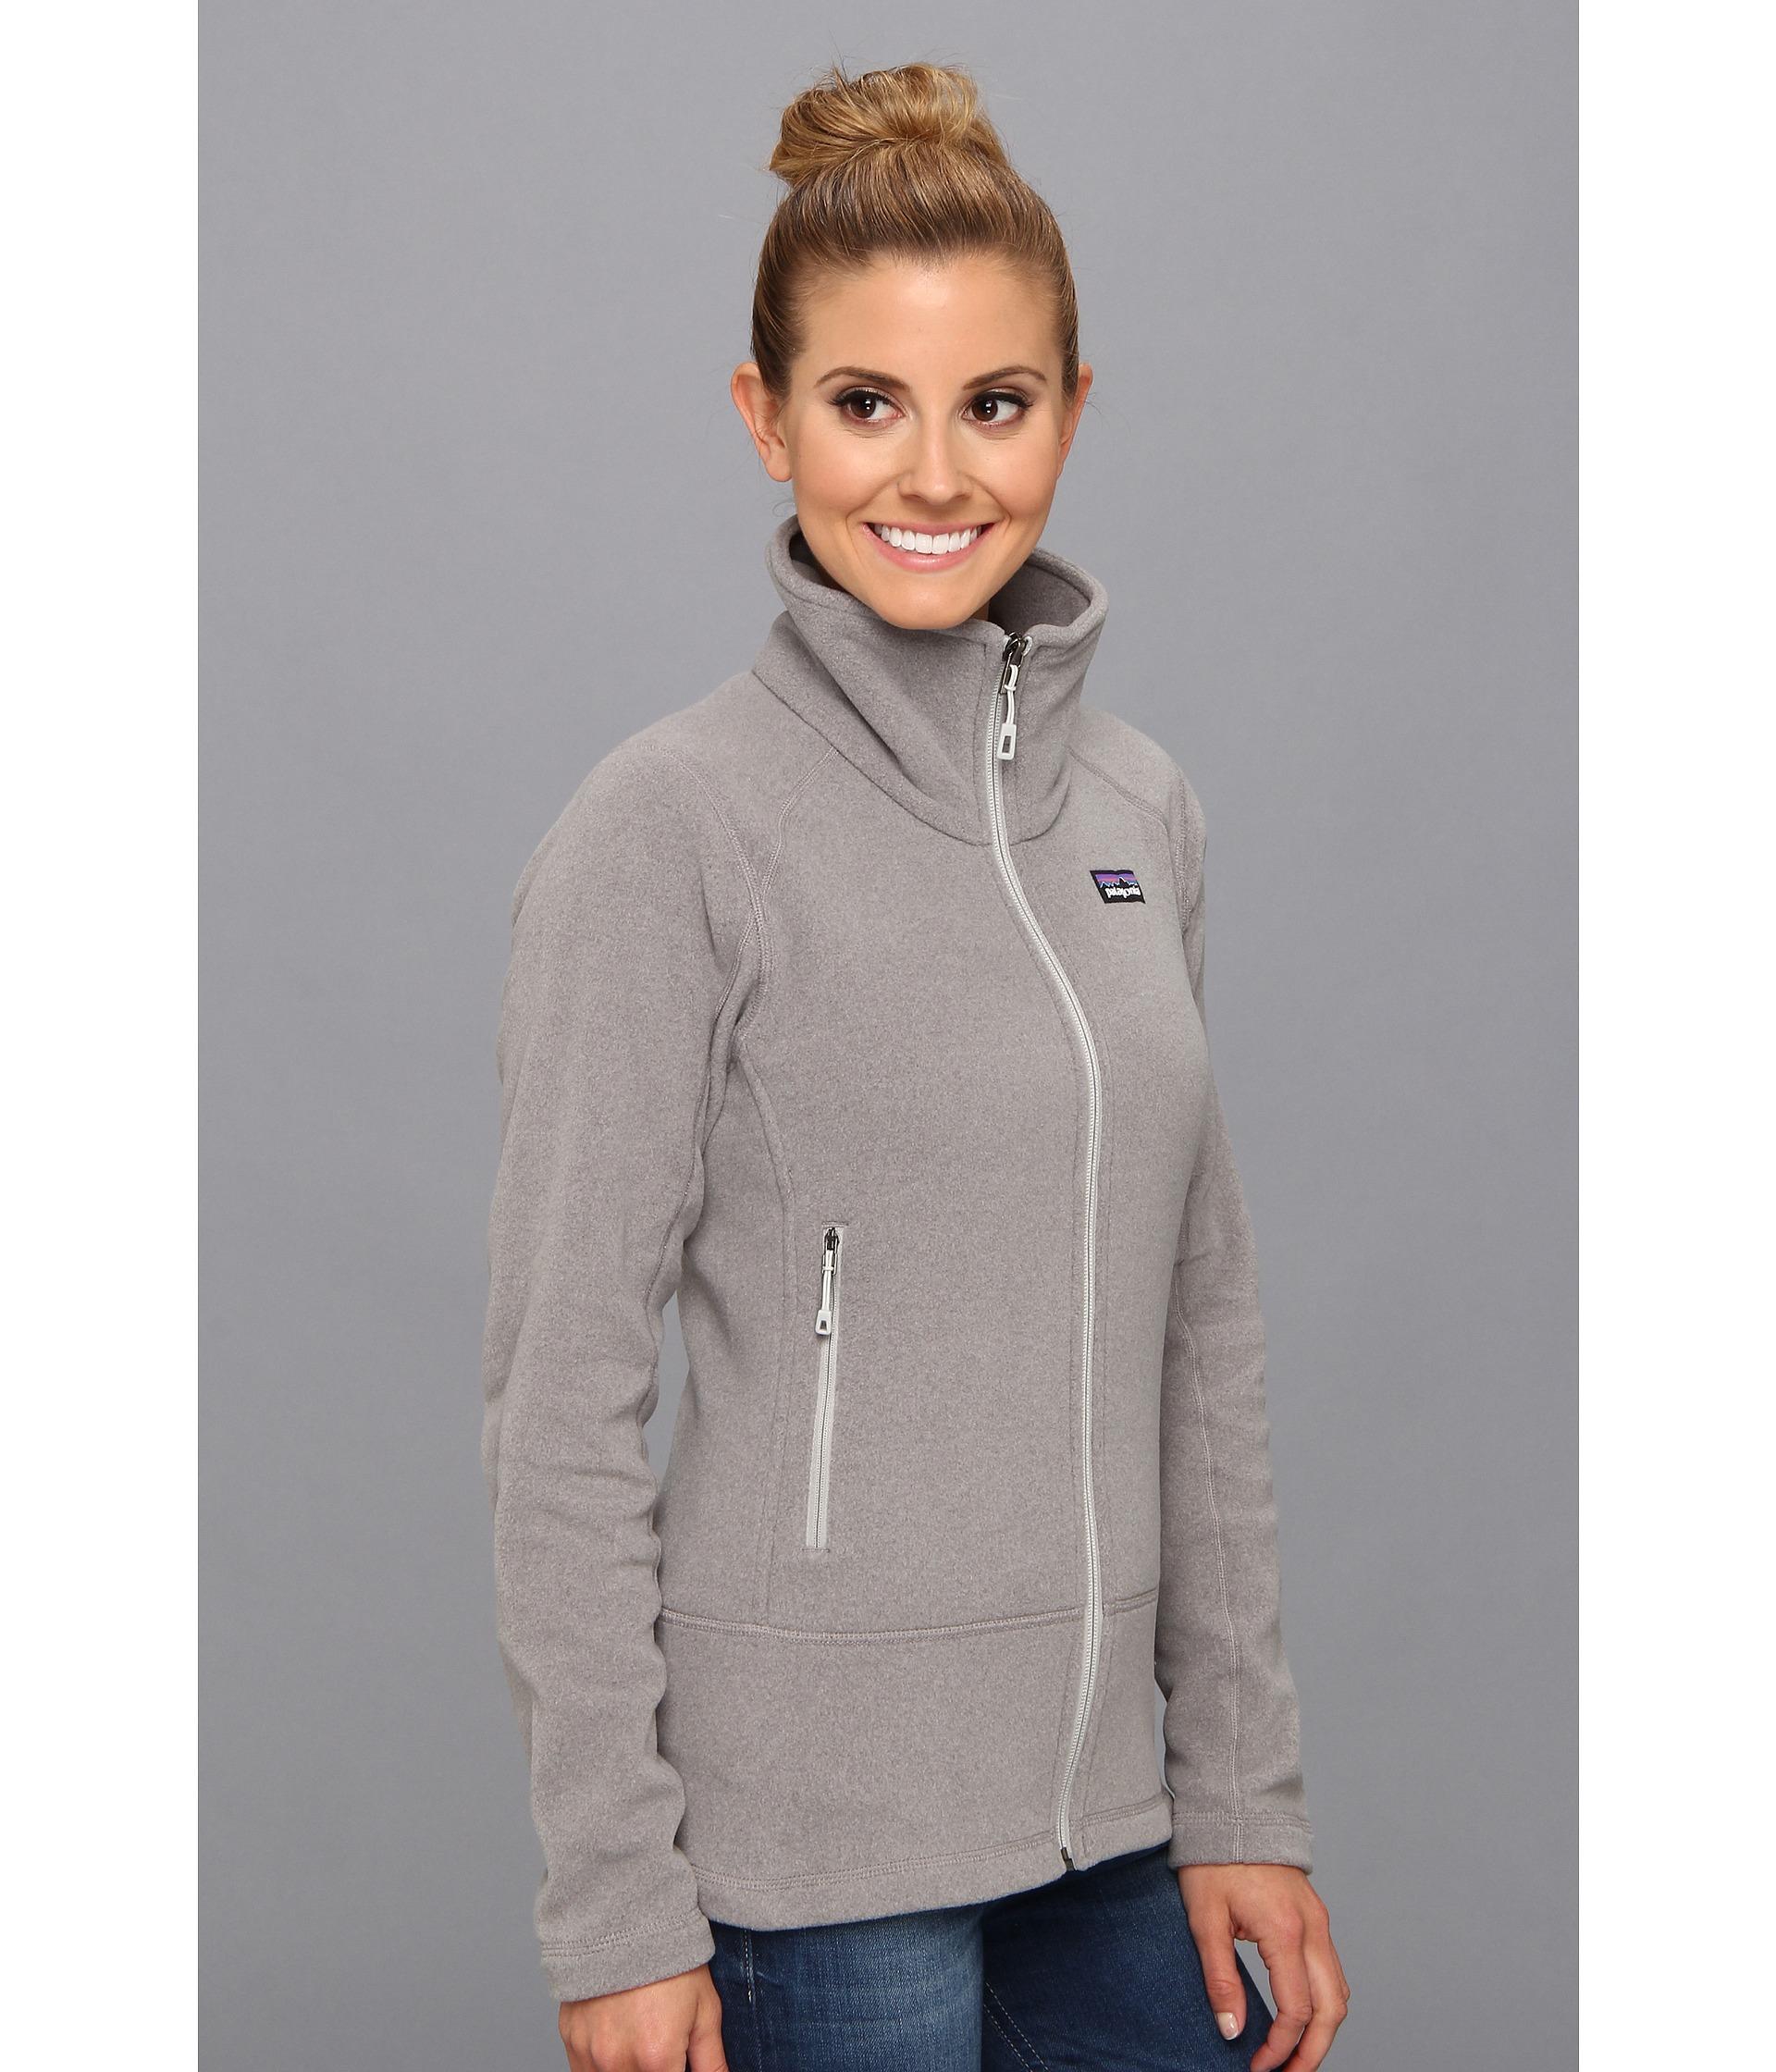 Patagonia emmilen fleece jacket women's